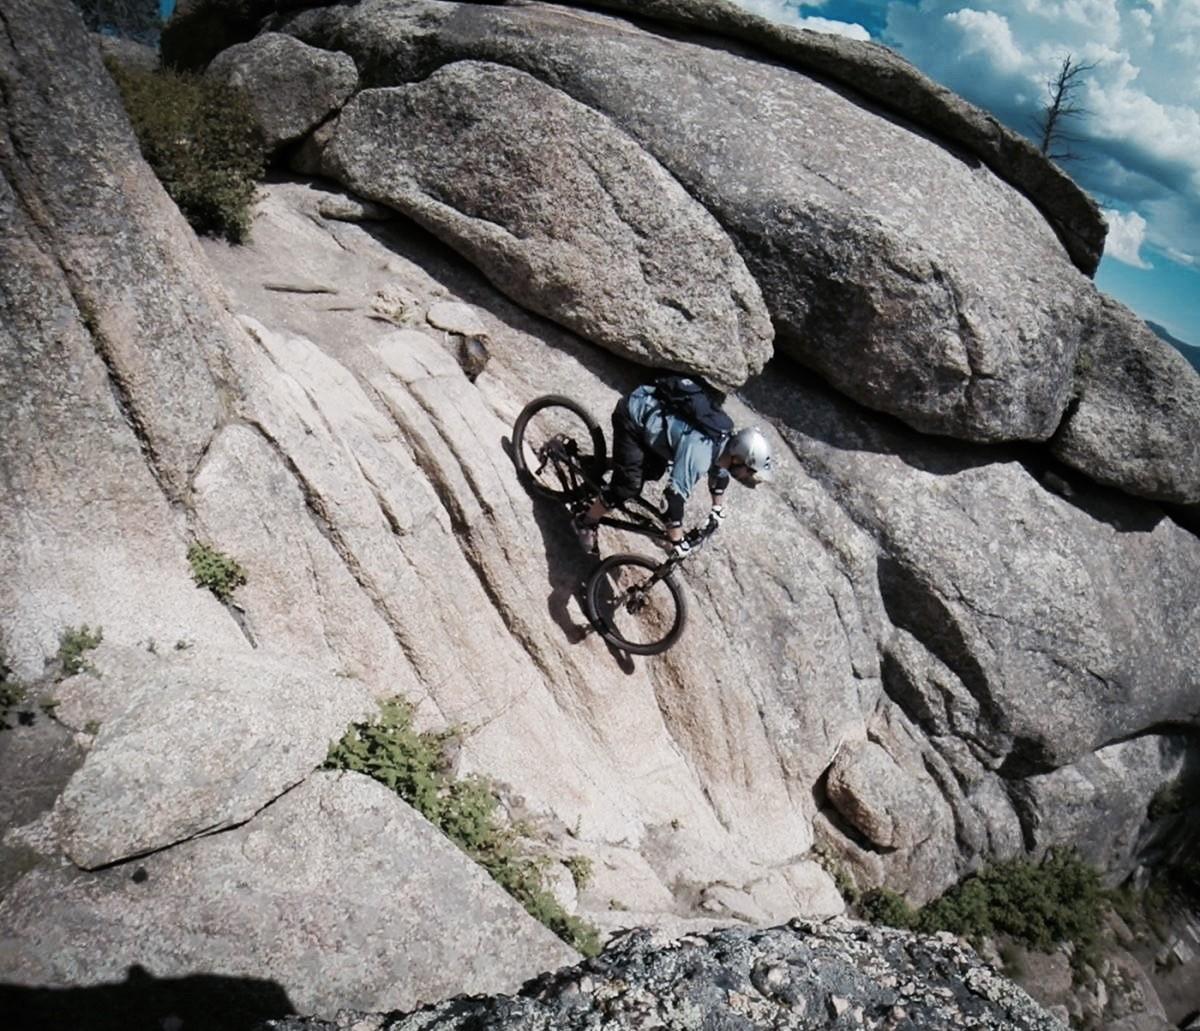 Photo: Michael Paul. Rider: Mark.